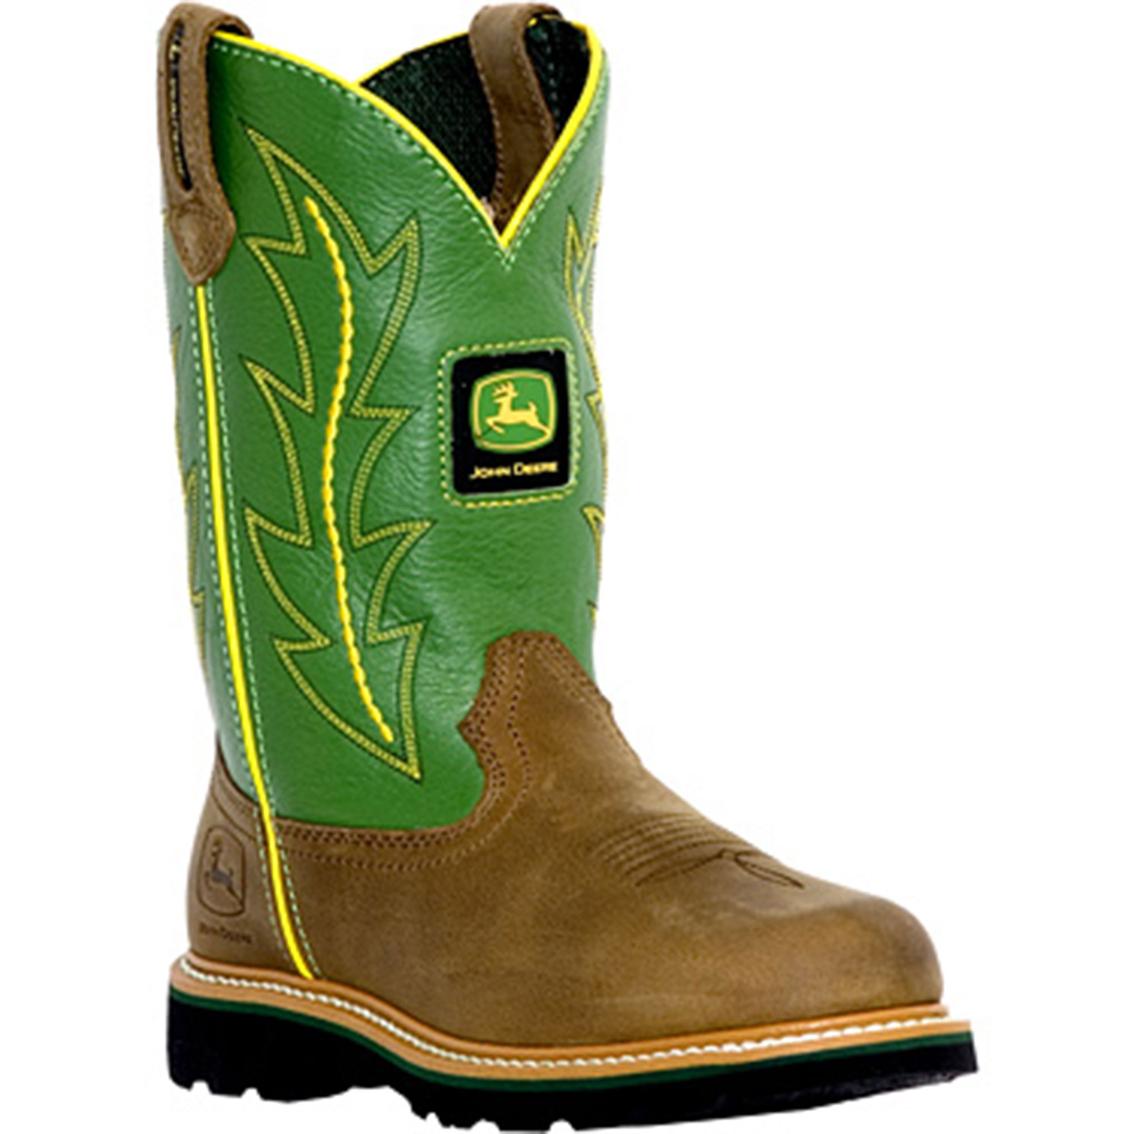 John Deere Women's Pull On Boots